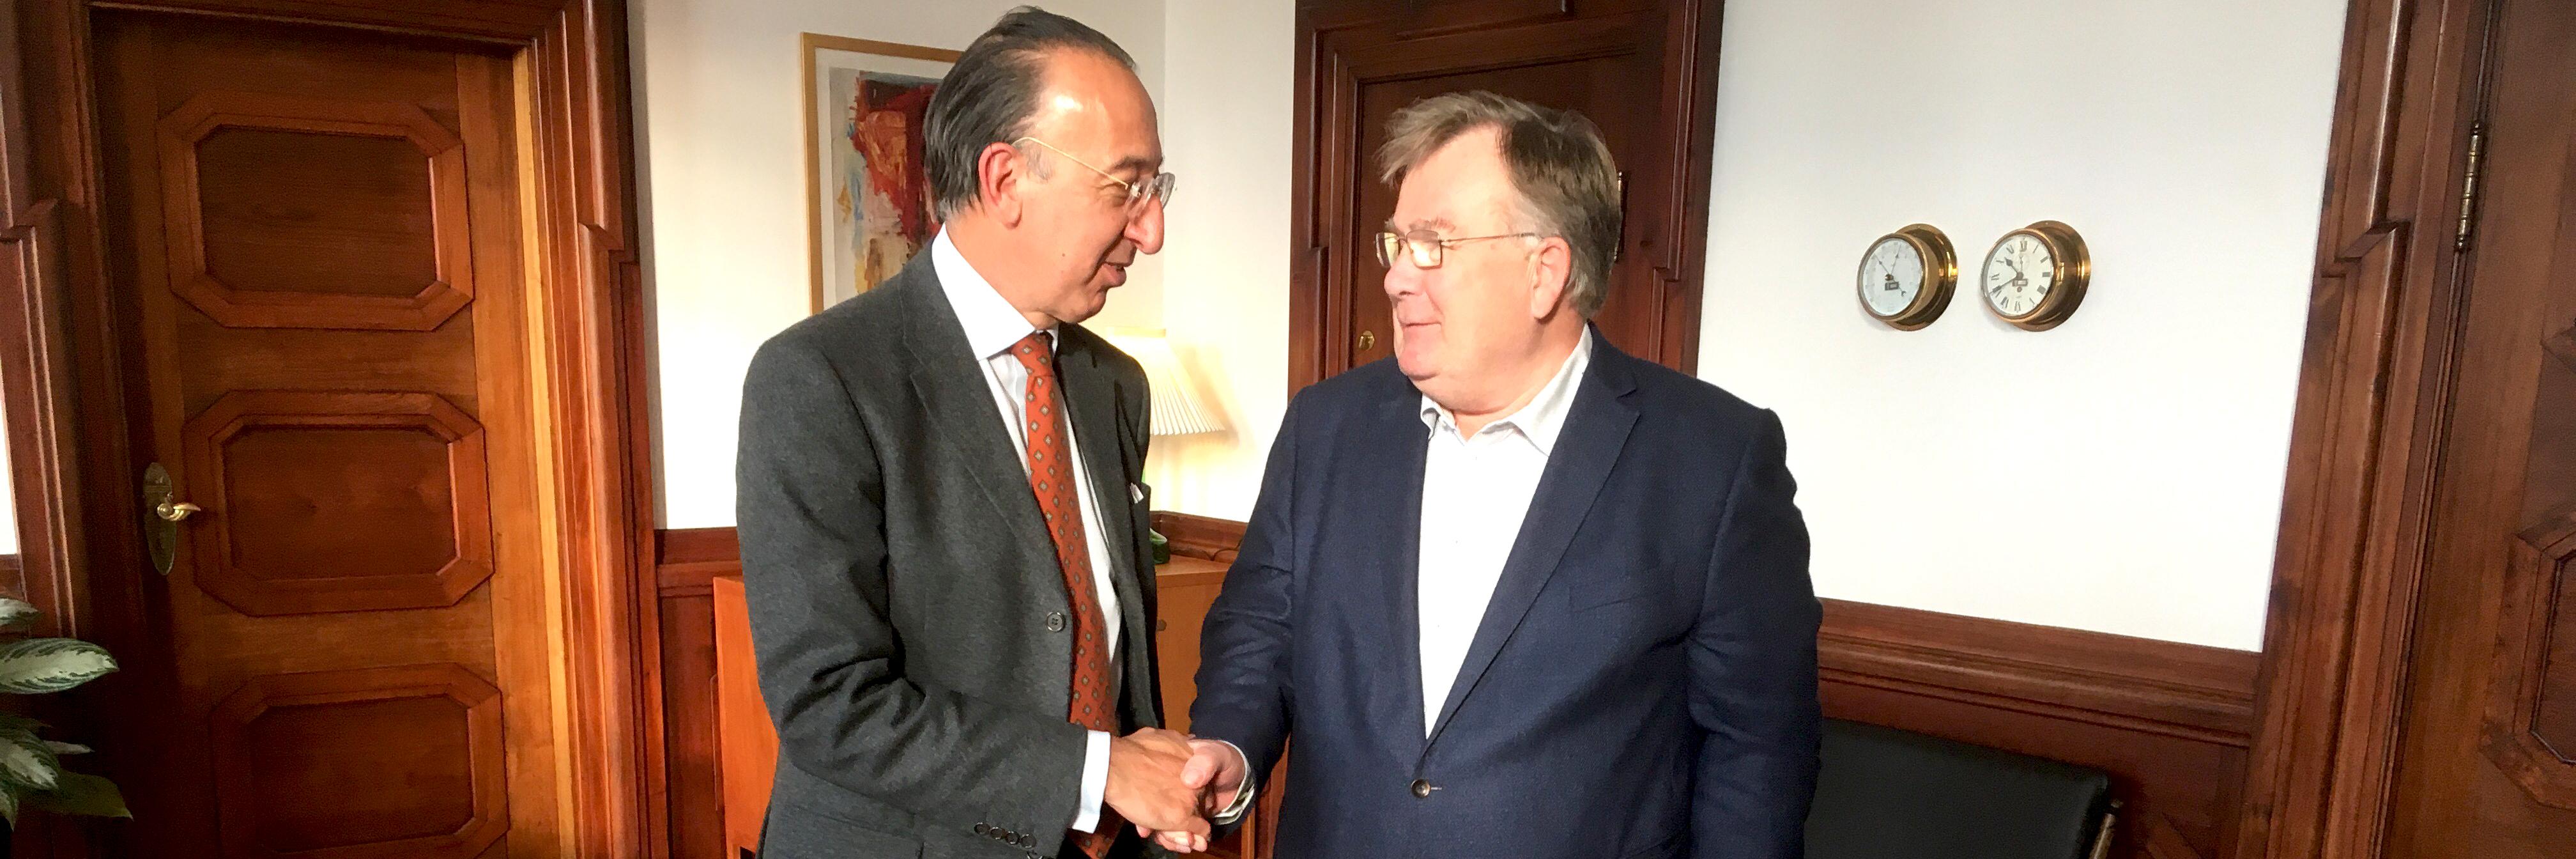 EDA Chief Executive visits Denmark